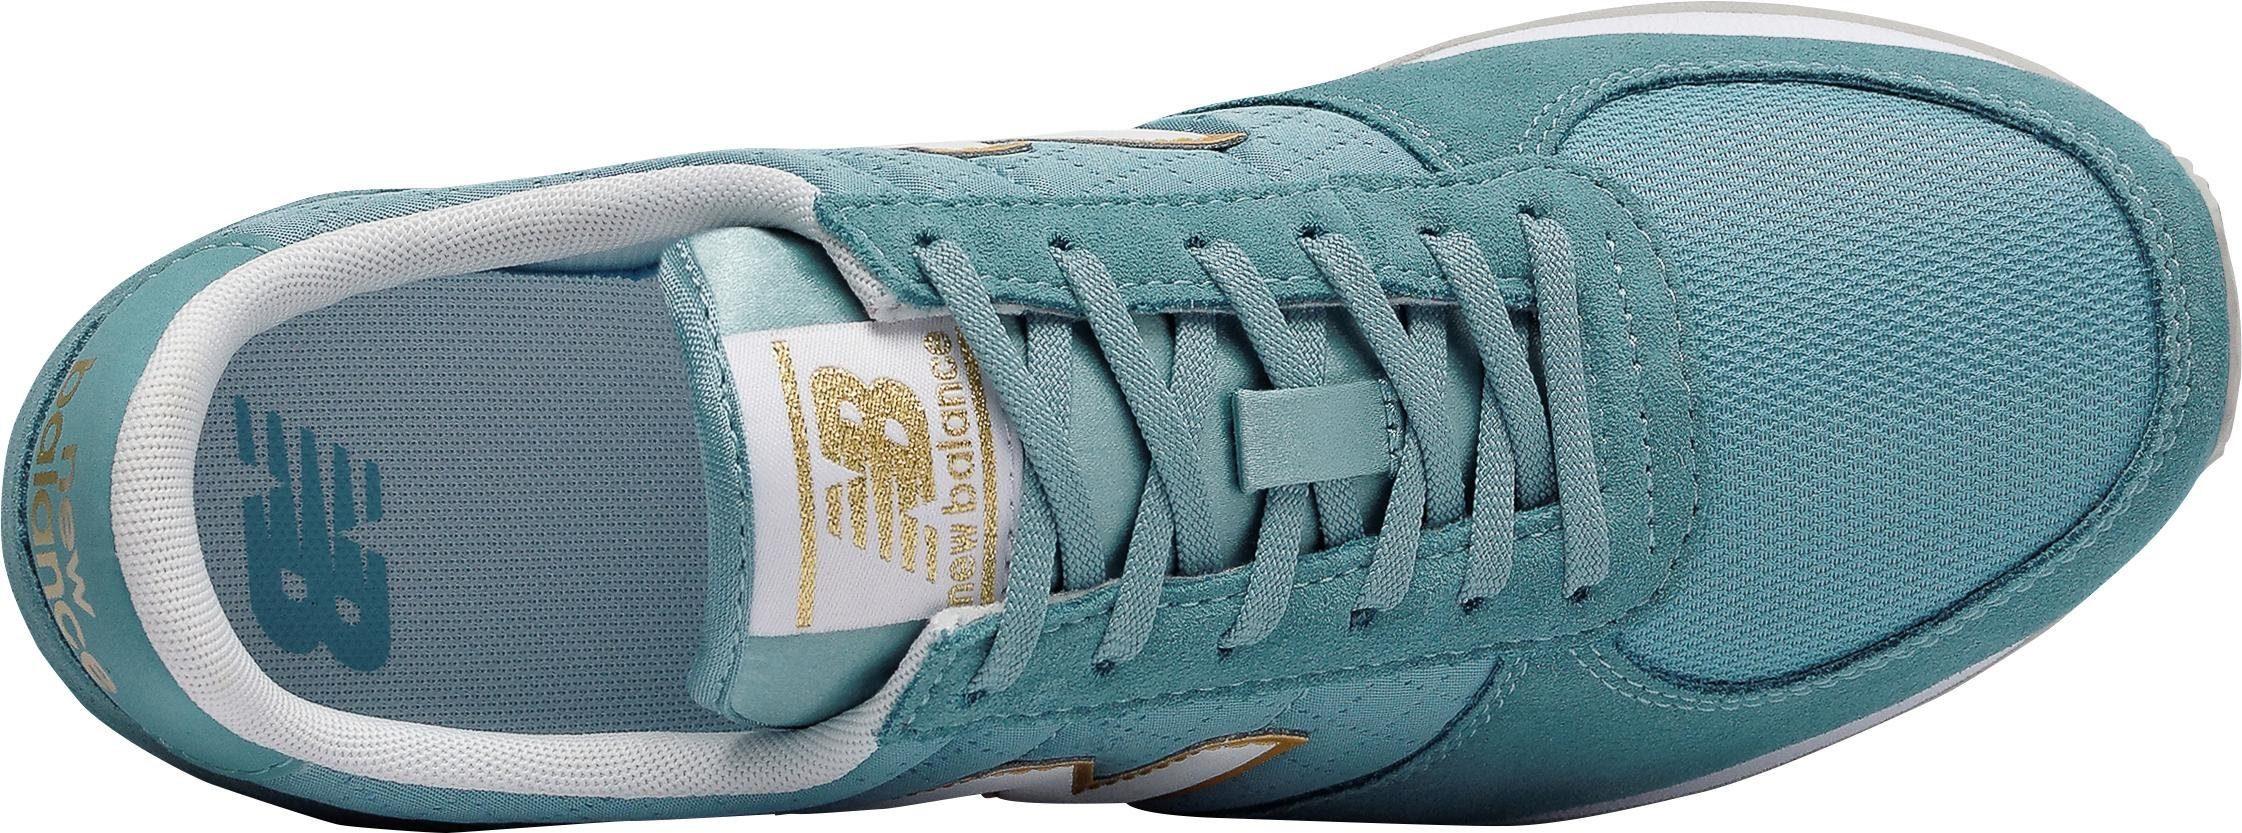 New New New »wl Sneaker Sneaker 220« 220« »wl Balance »wl Balance Balance New Sneaker 220« Fg0tw0Aq